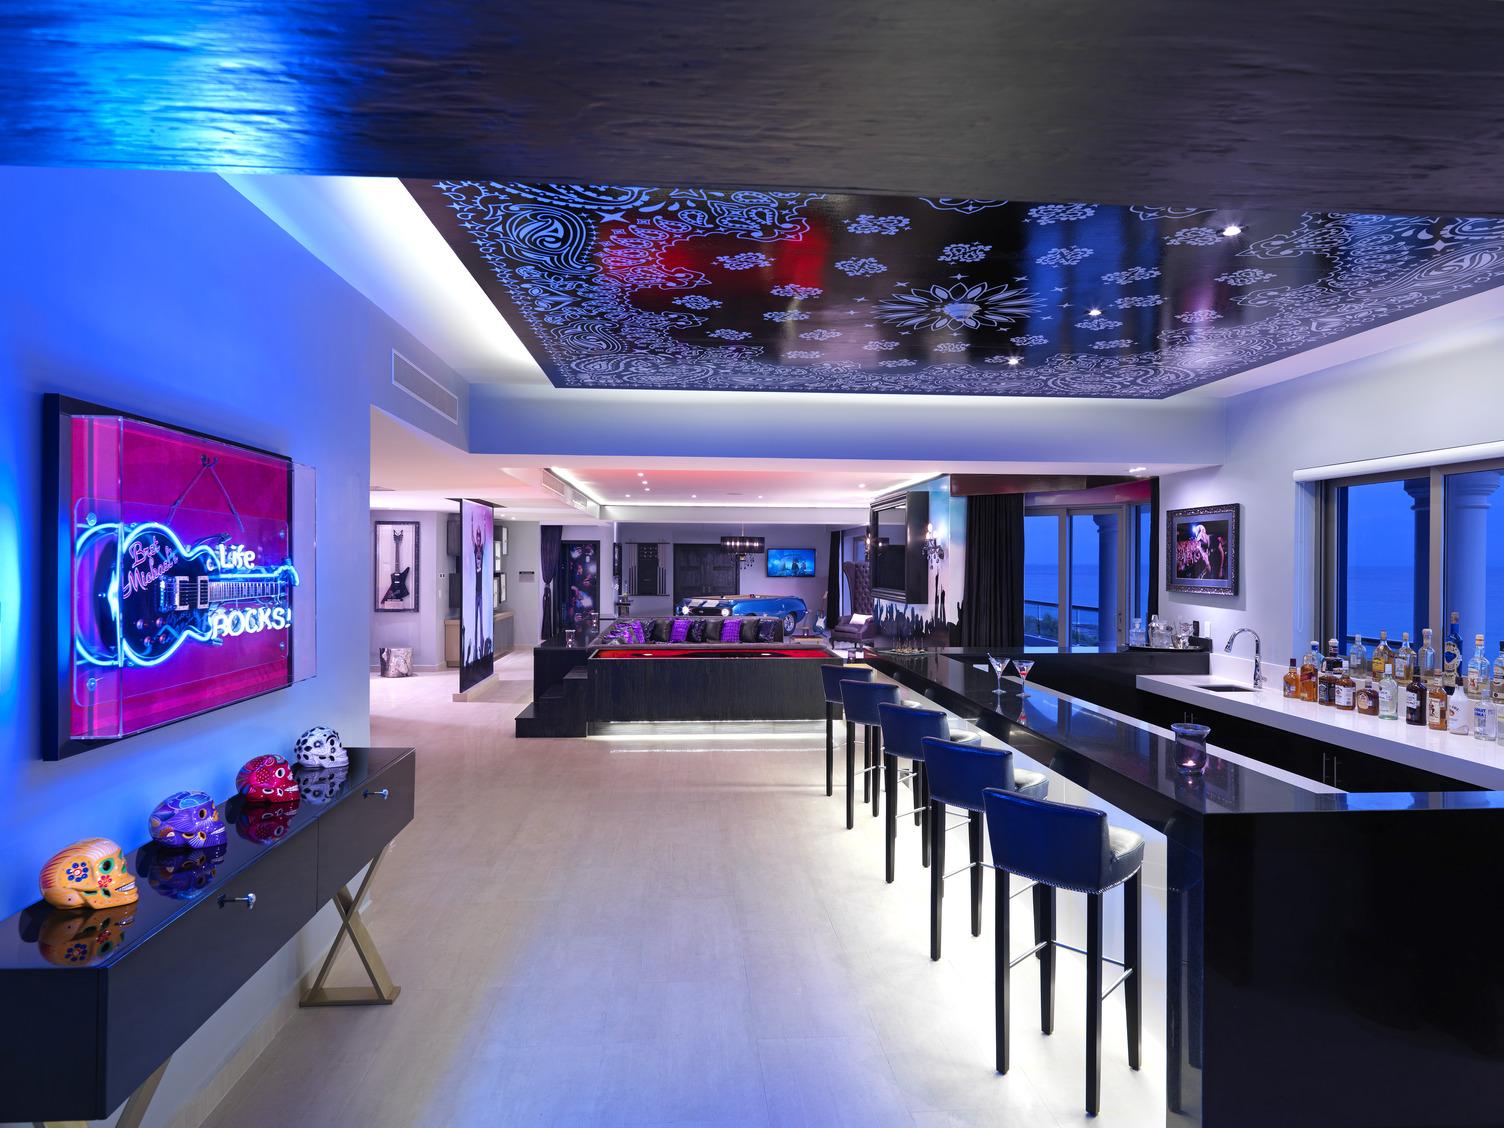 Travel Agency All-Inclusive Resort Heaven at Hard Rock Hotel Riviera Maya 55